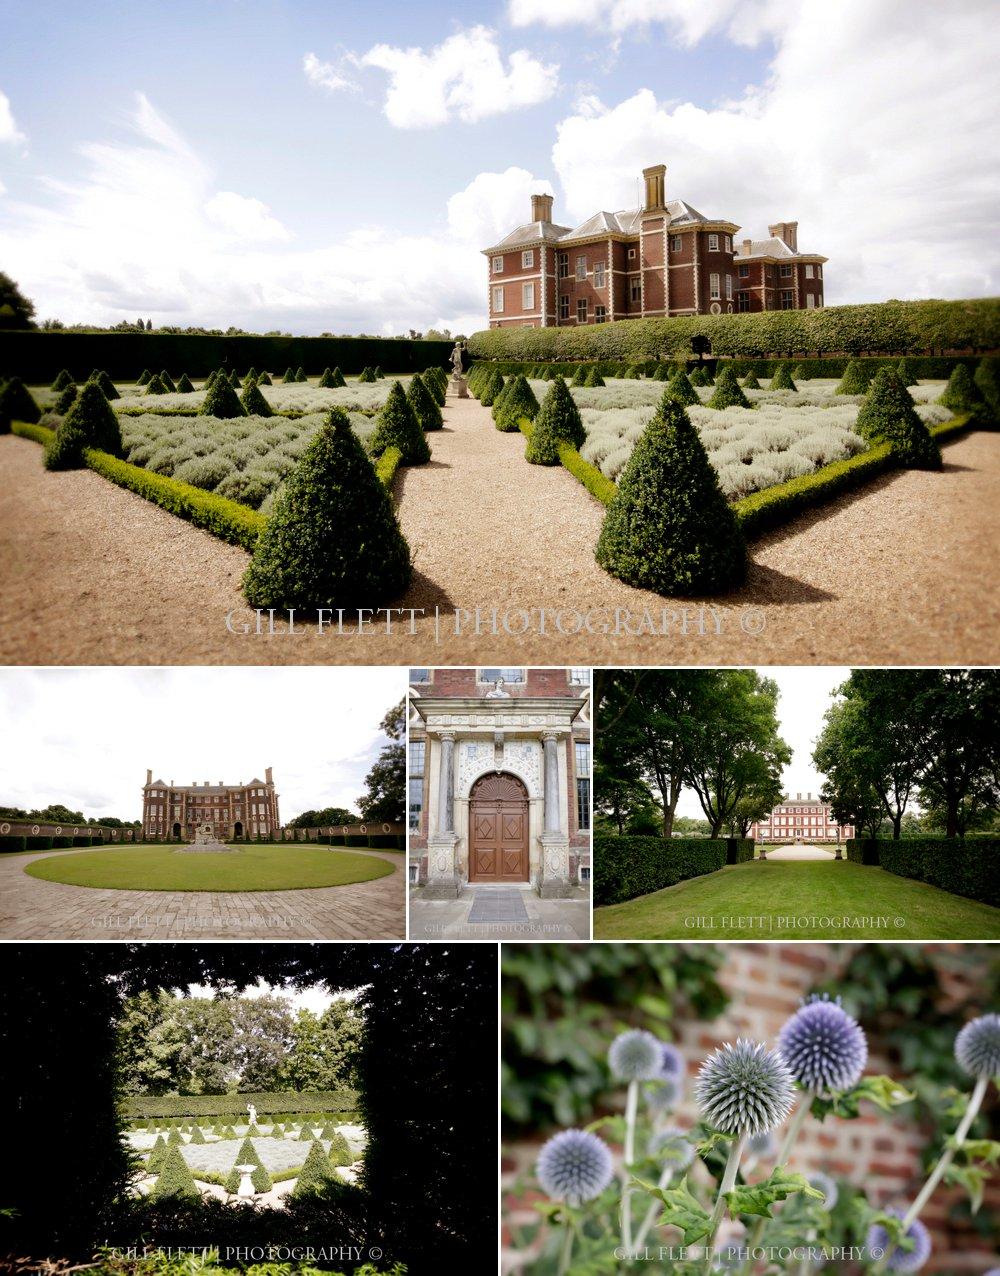 ham-house-national-trust-wedding-venue-gillflett-photo.jpg